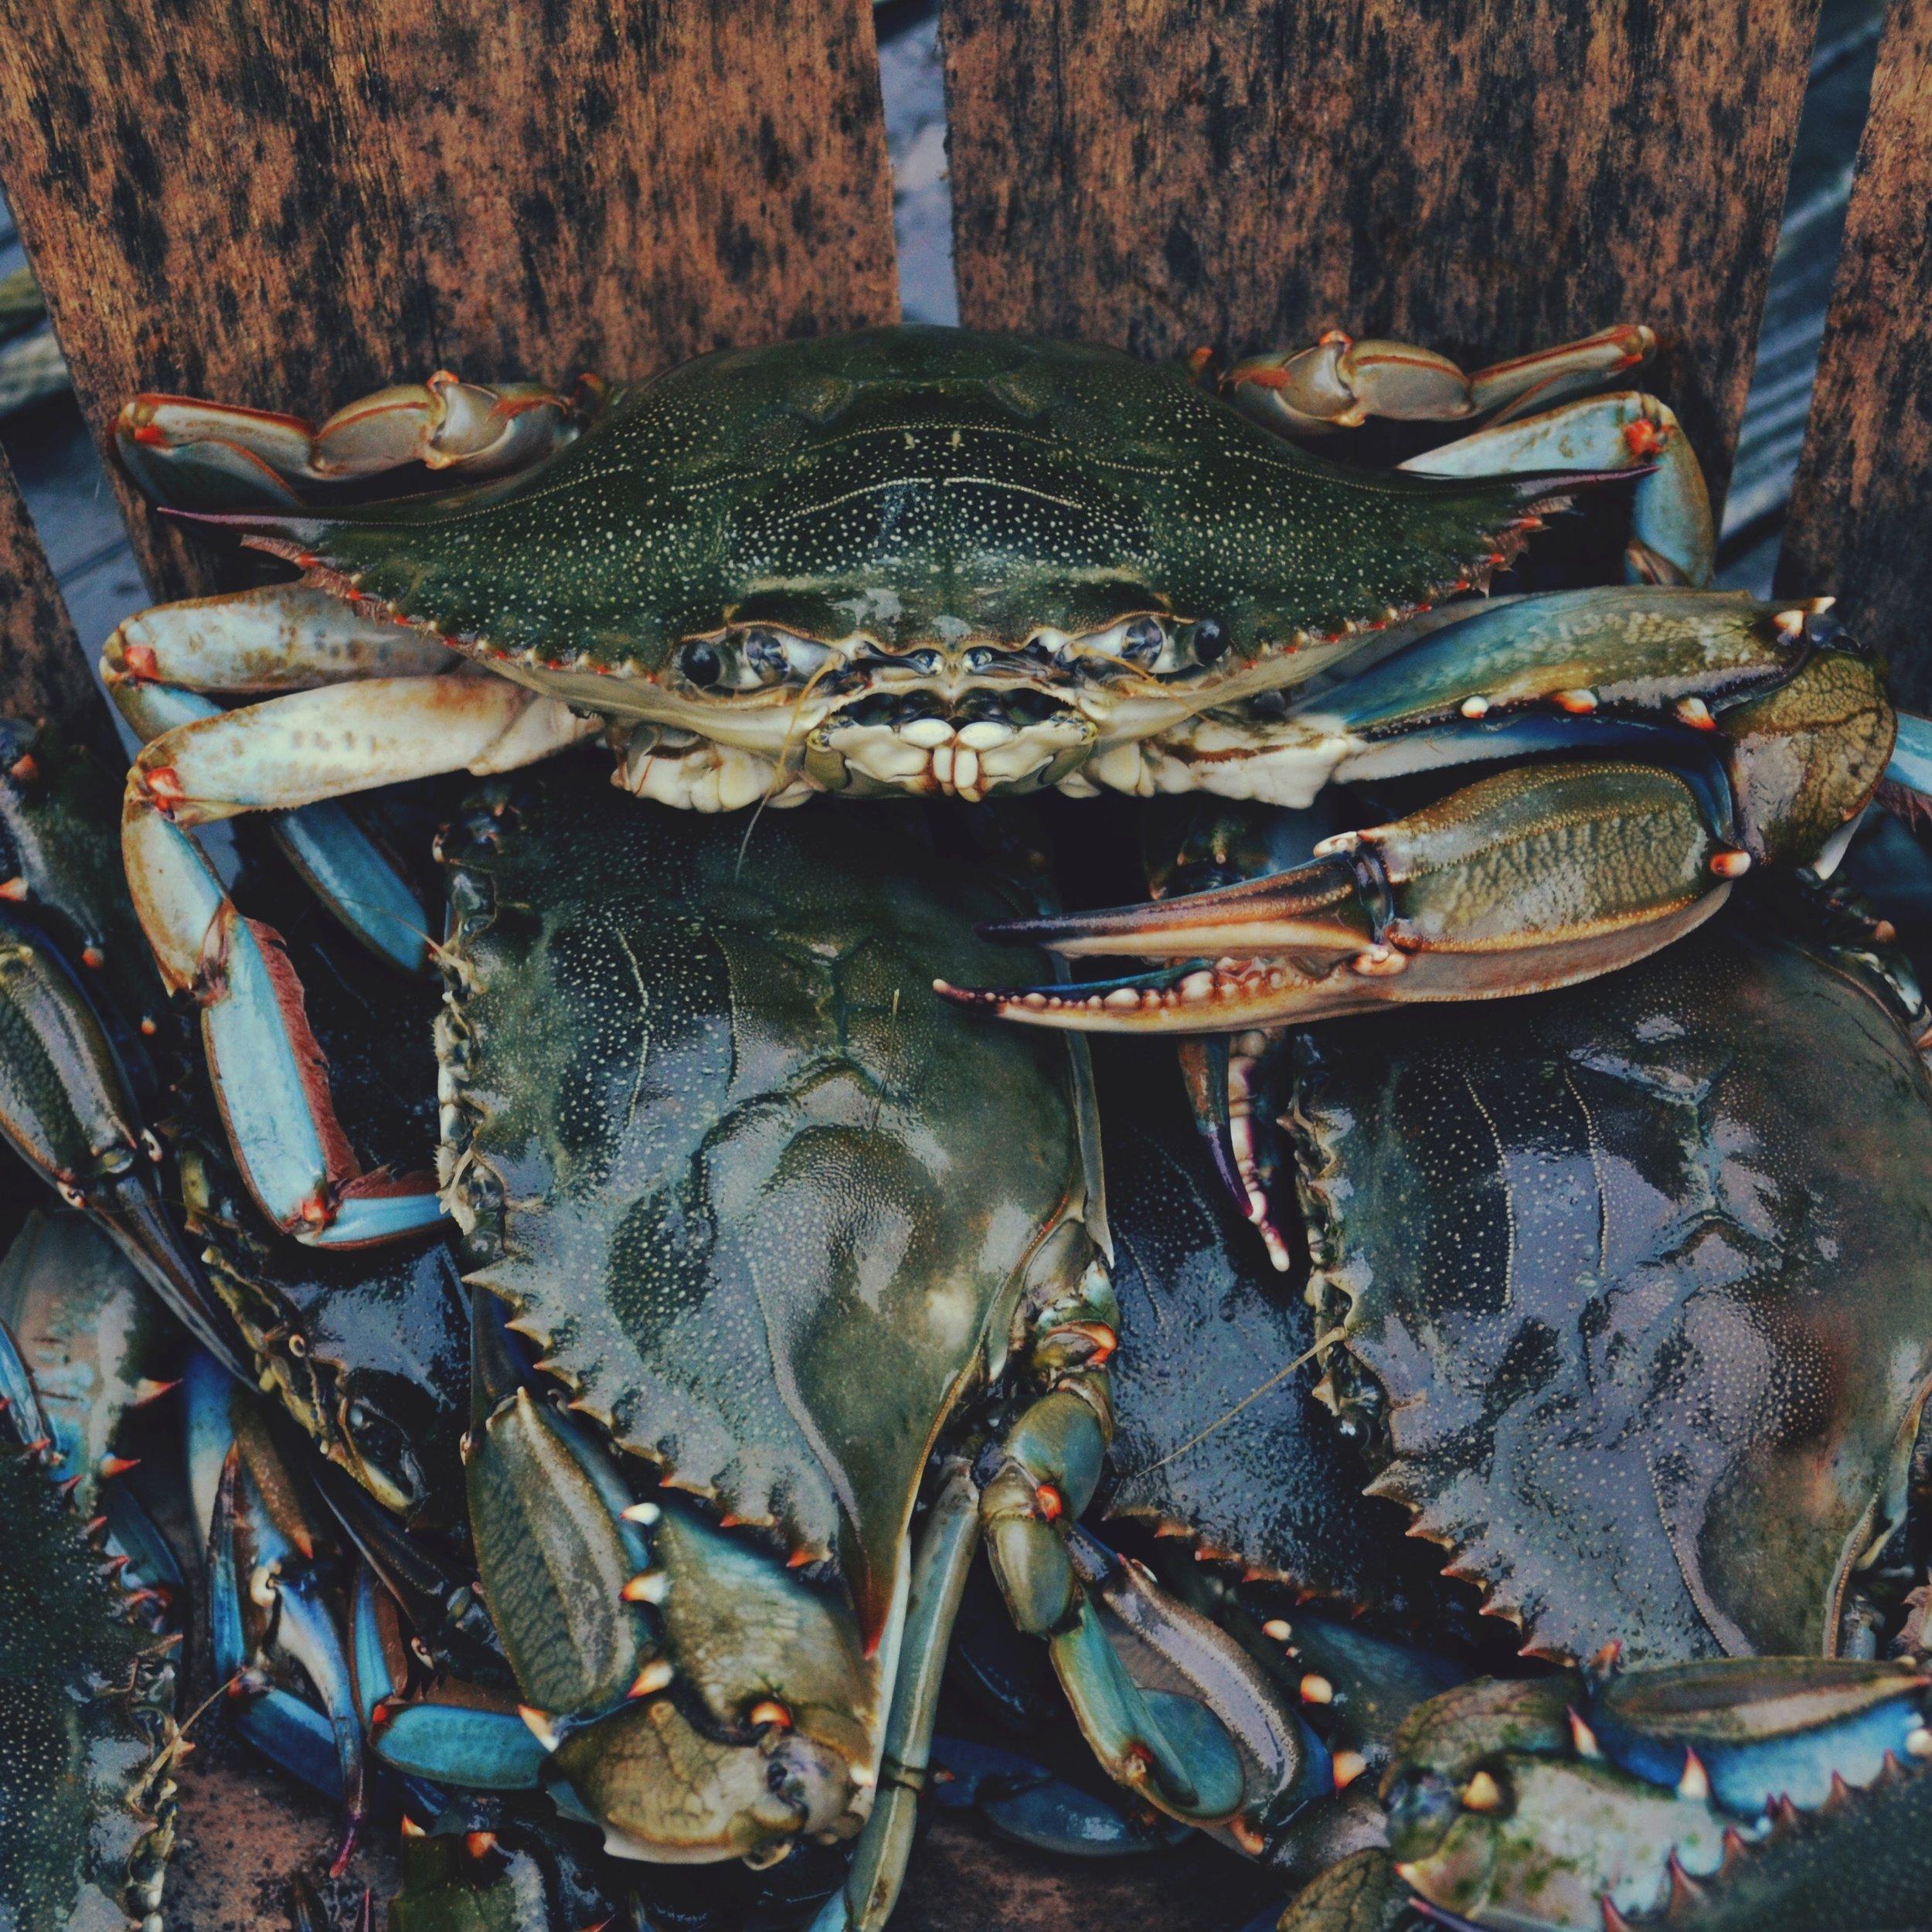 soft shell crab.jpg